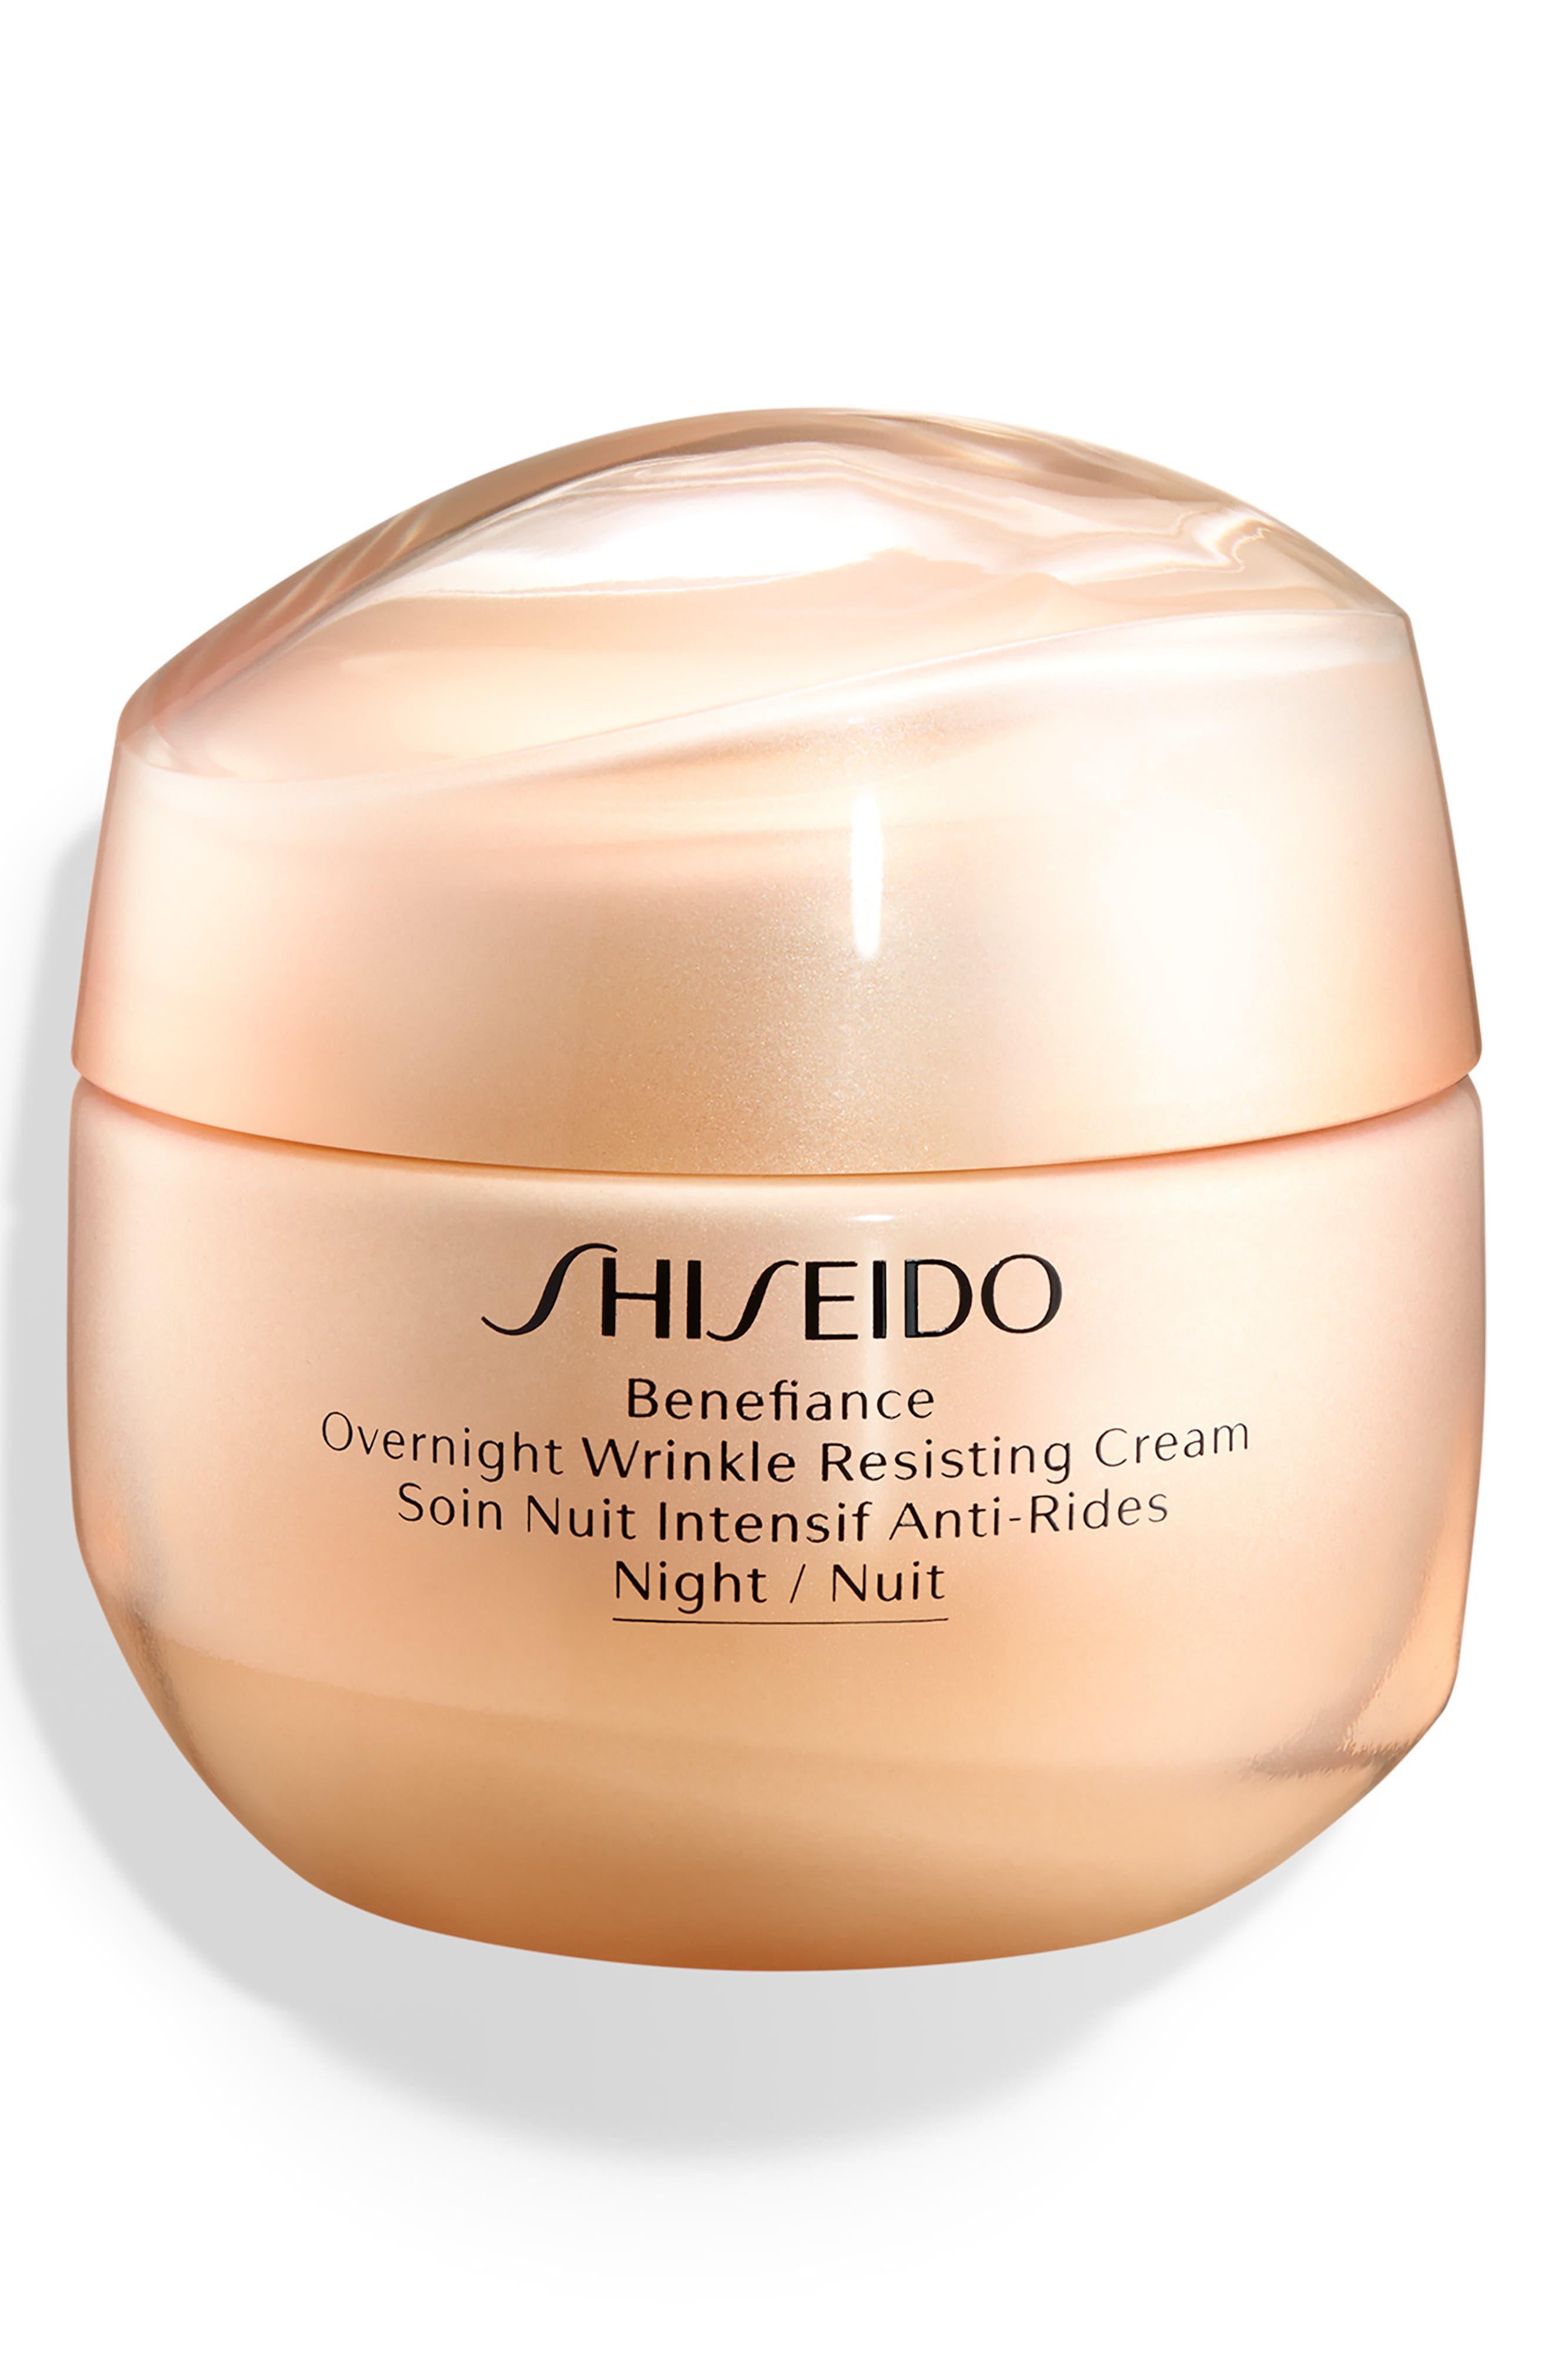 Benefiance Overnight Wrinkle Resisting Cream   Nordstrom